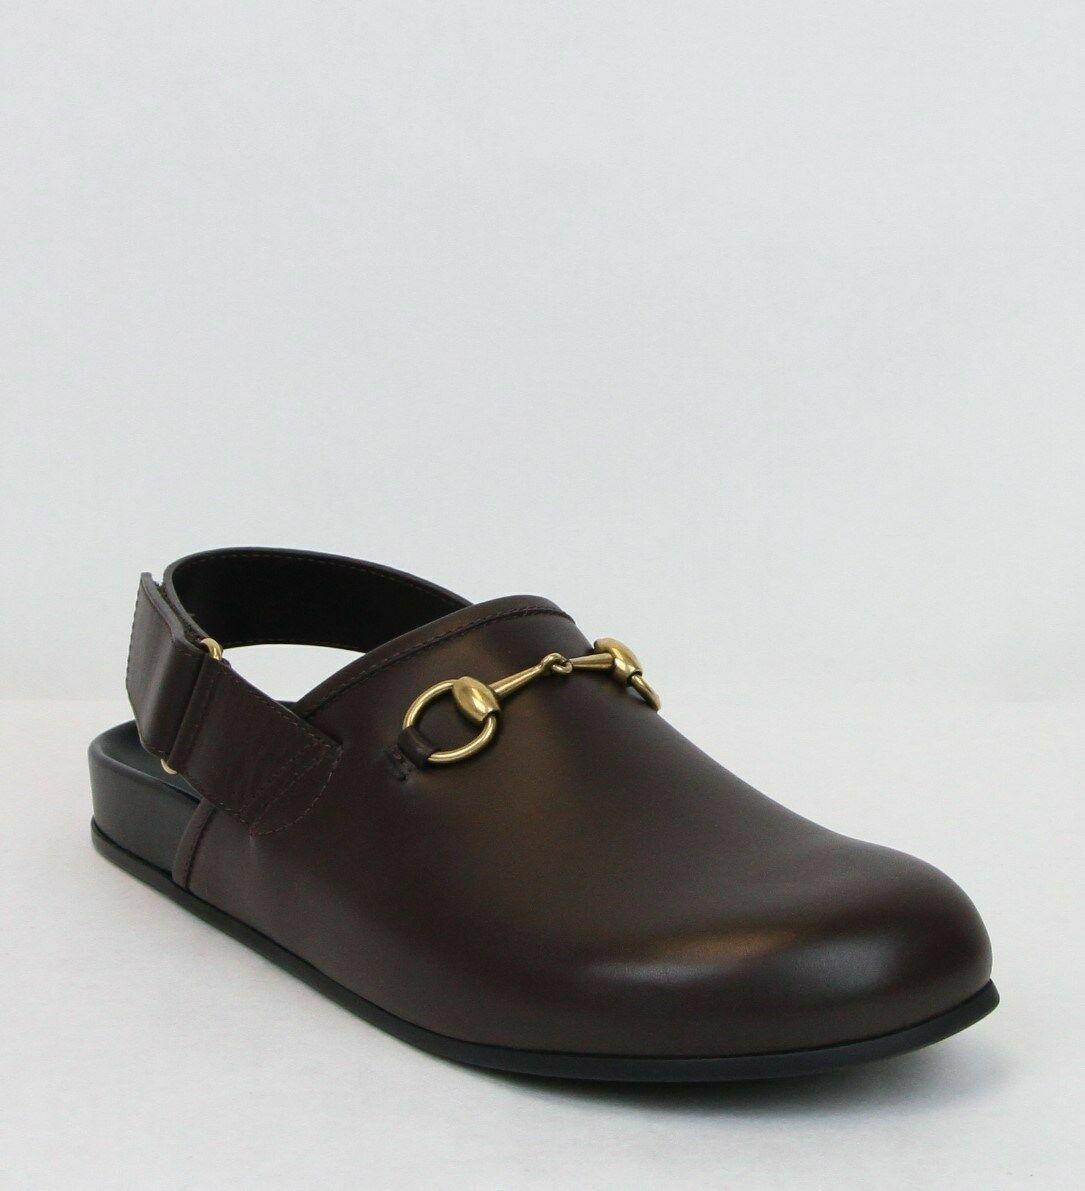 Gucci Men's Dark Brown Leather Classic Horsebit Calf Sandals 473491 2140